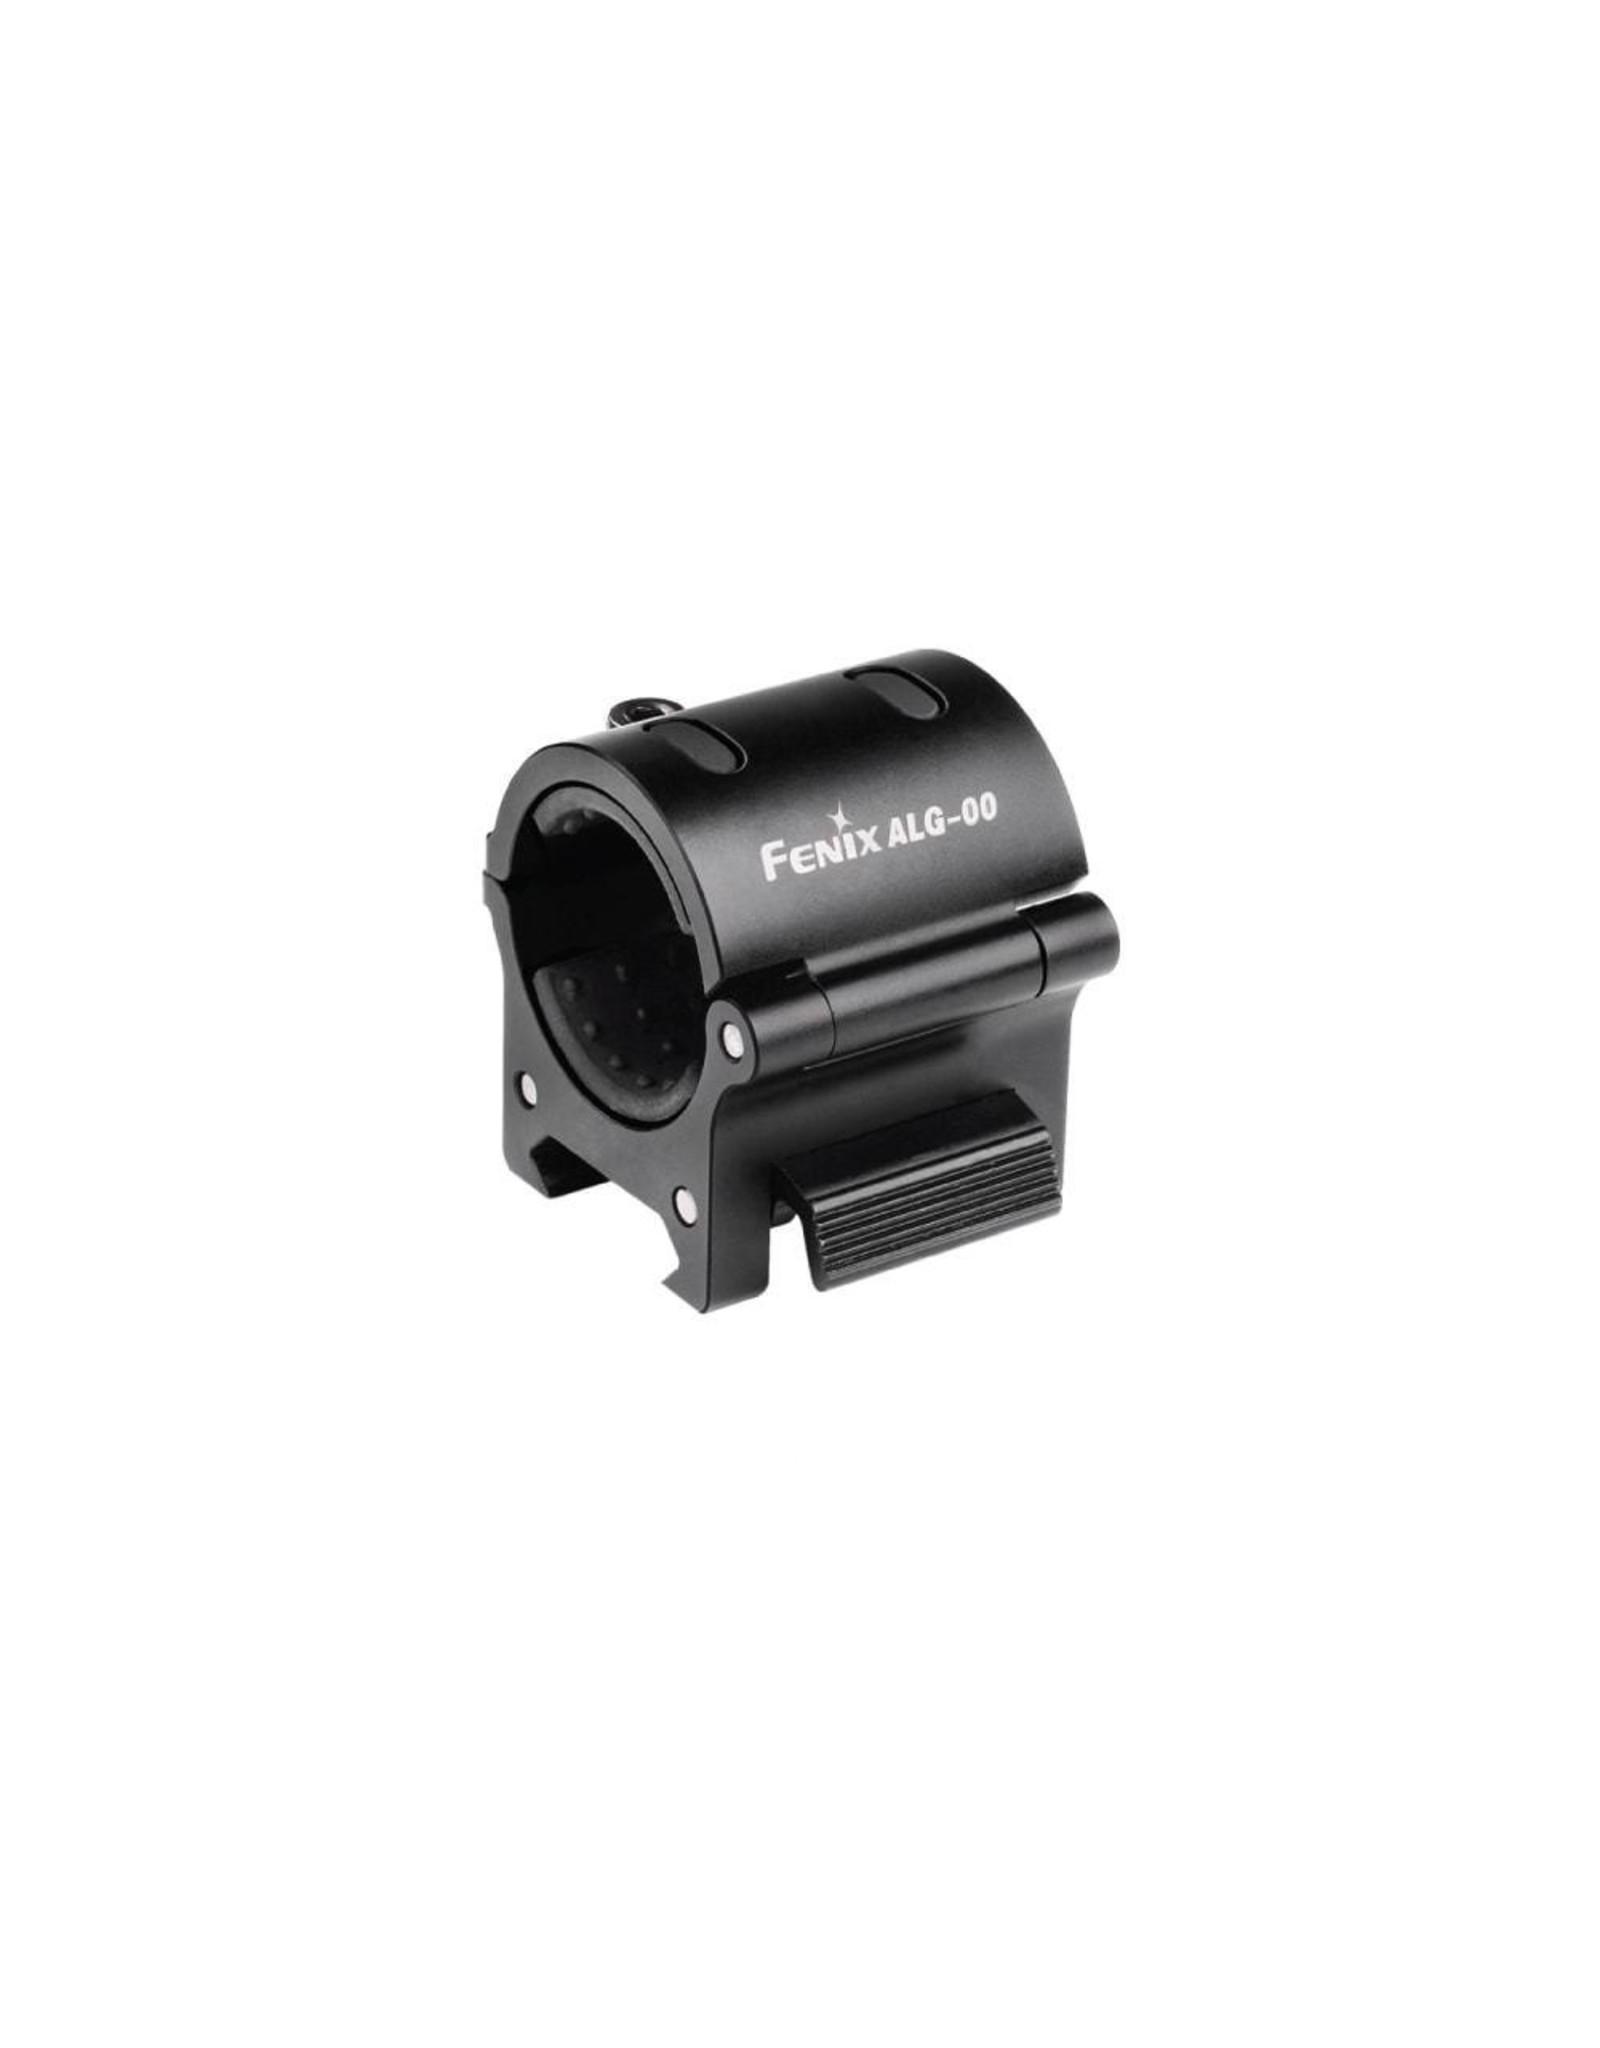 Fenix - ALG-00 Flashlight Ring Mount